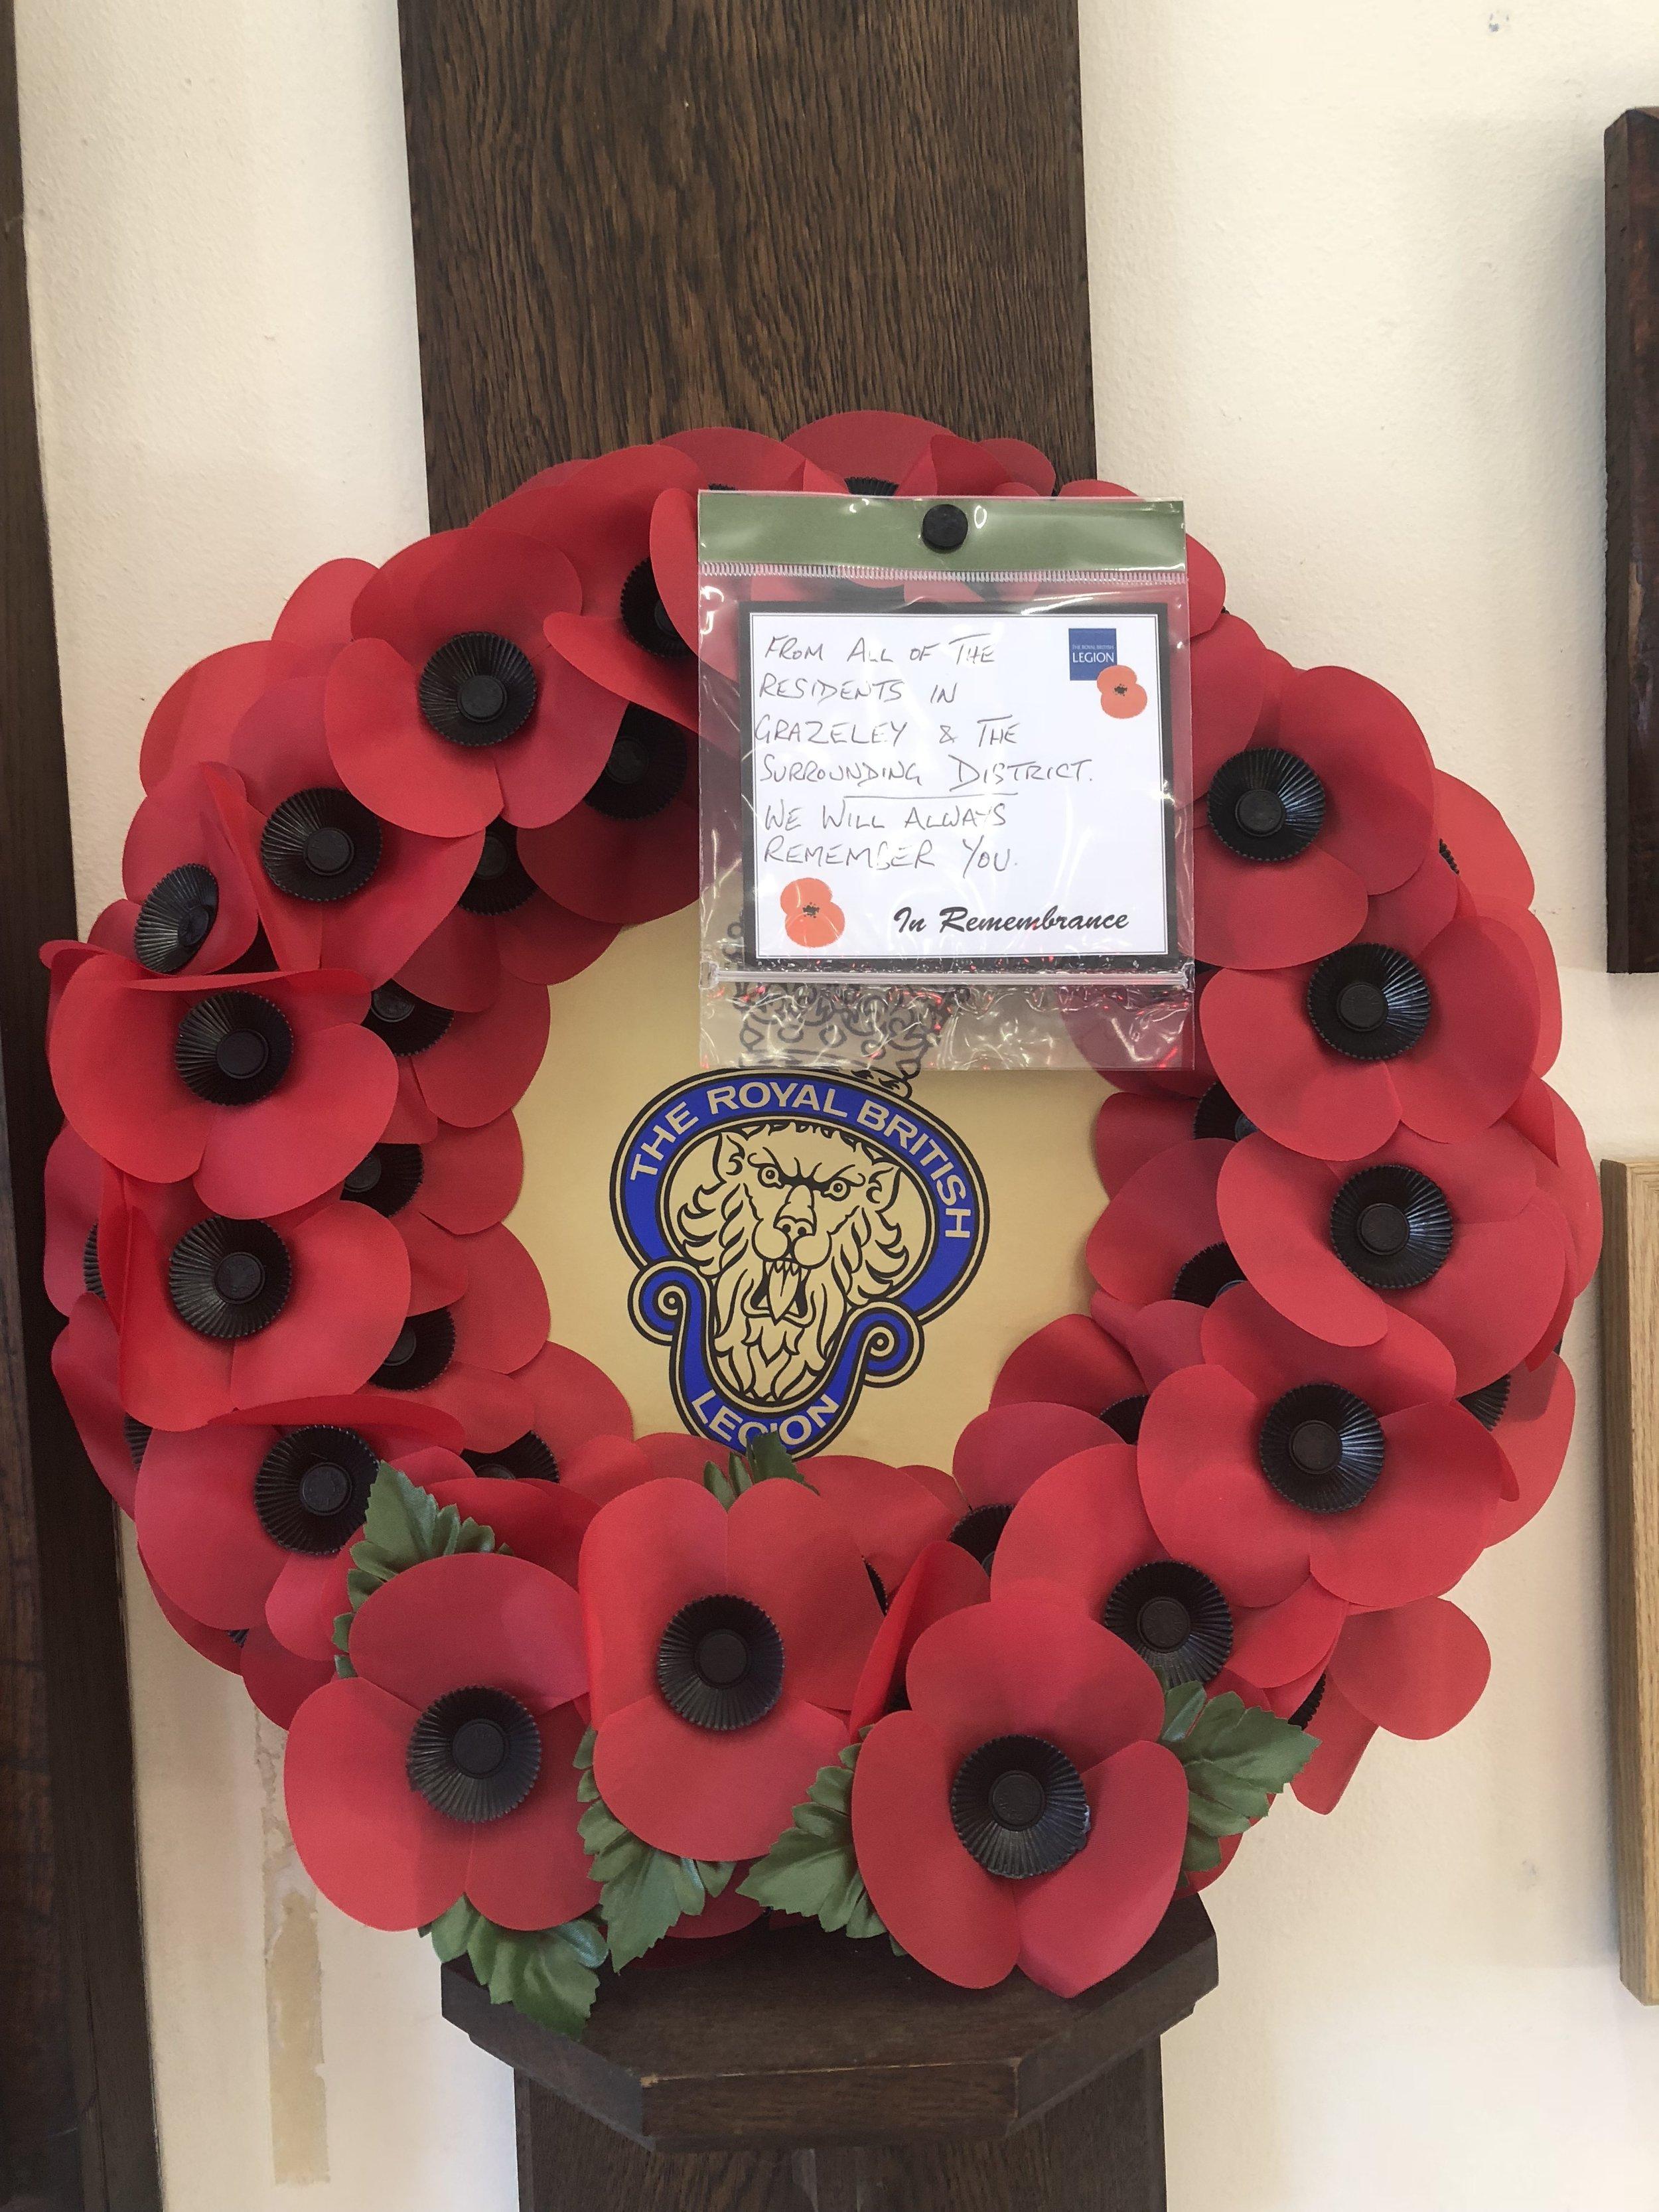 The Royal British Legion Memorial Wreath